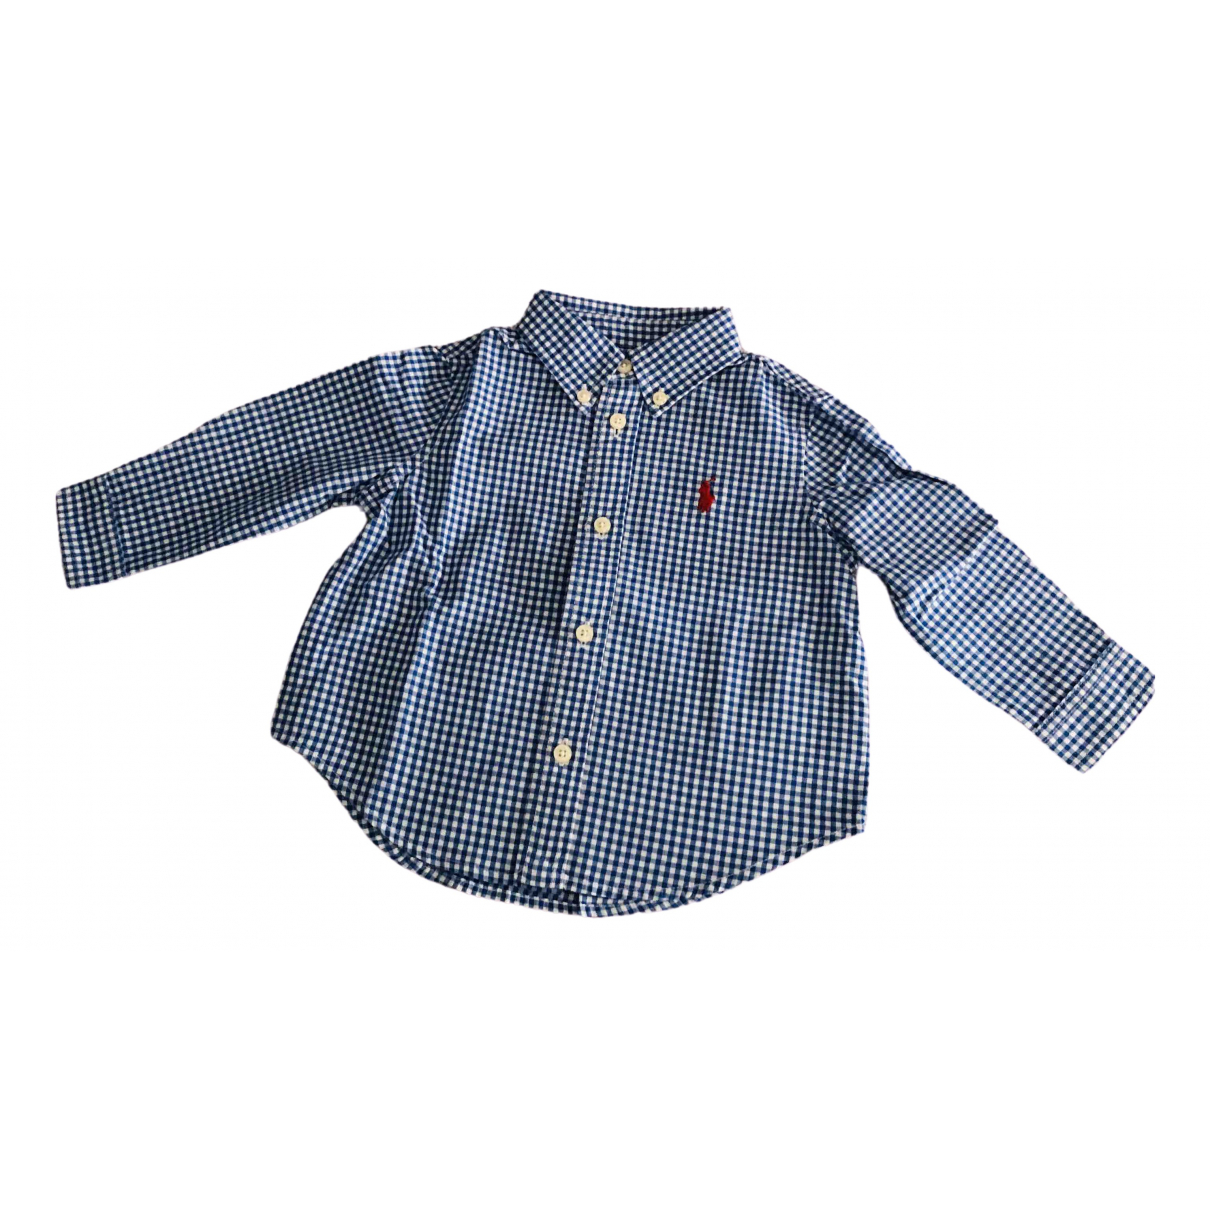 Ralph Lauren \N Blue Cotton  top for Kids 9 months - up to 71cm FR